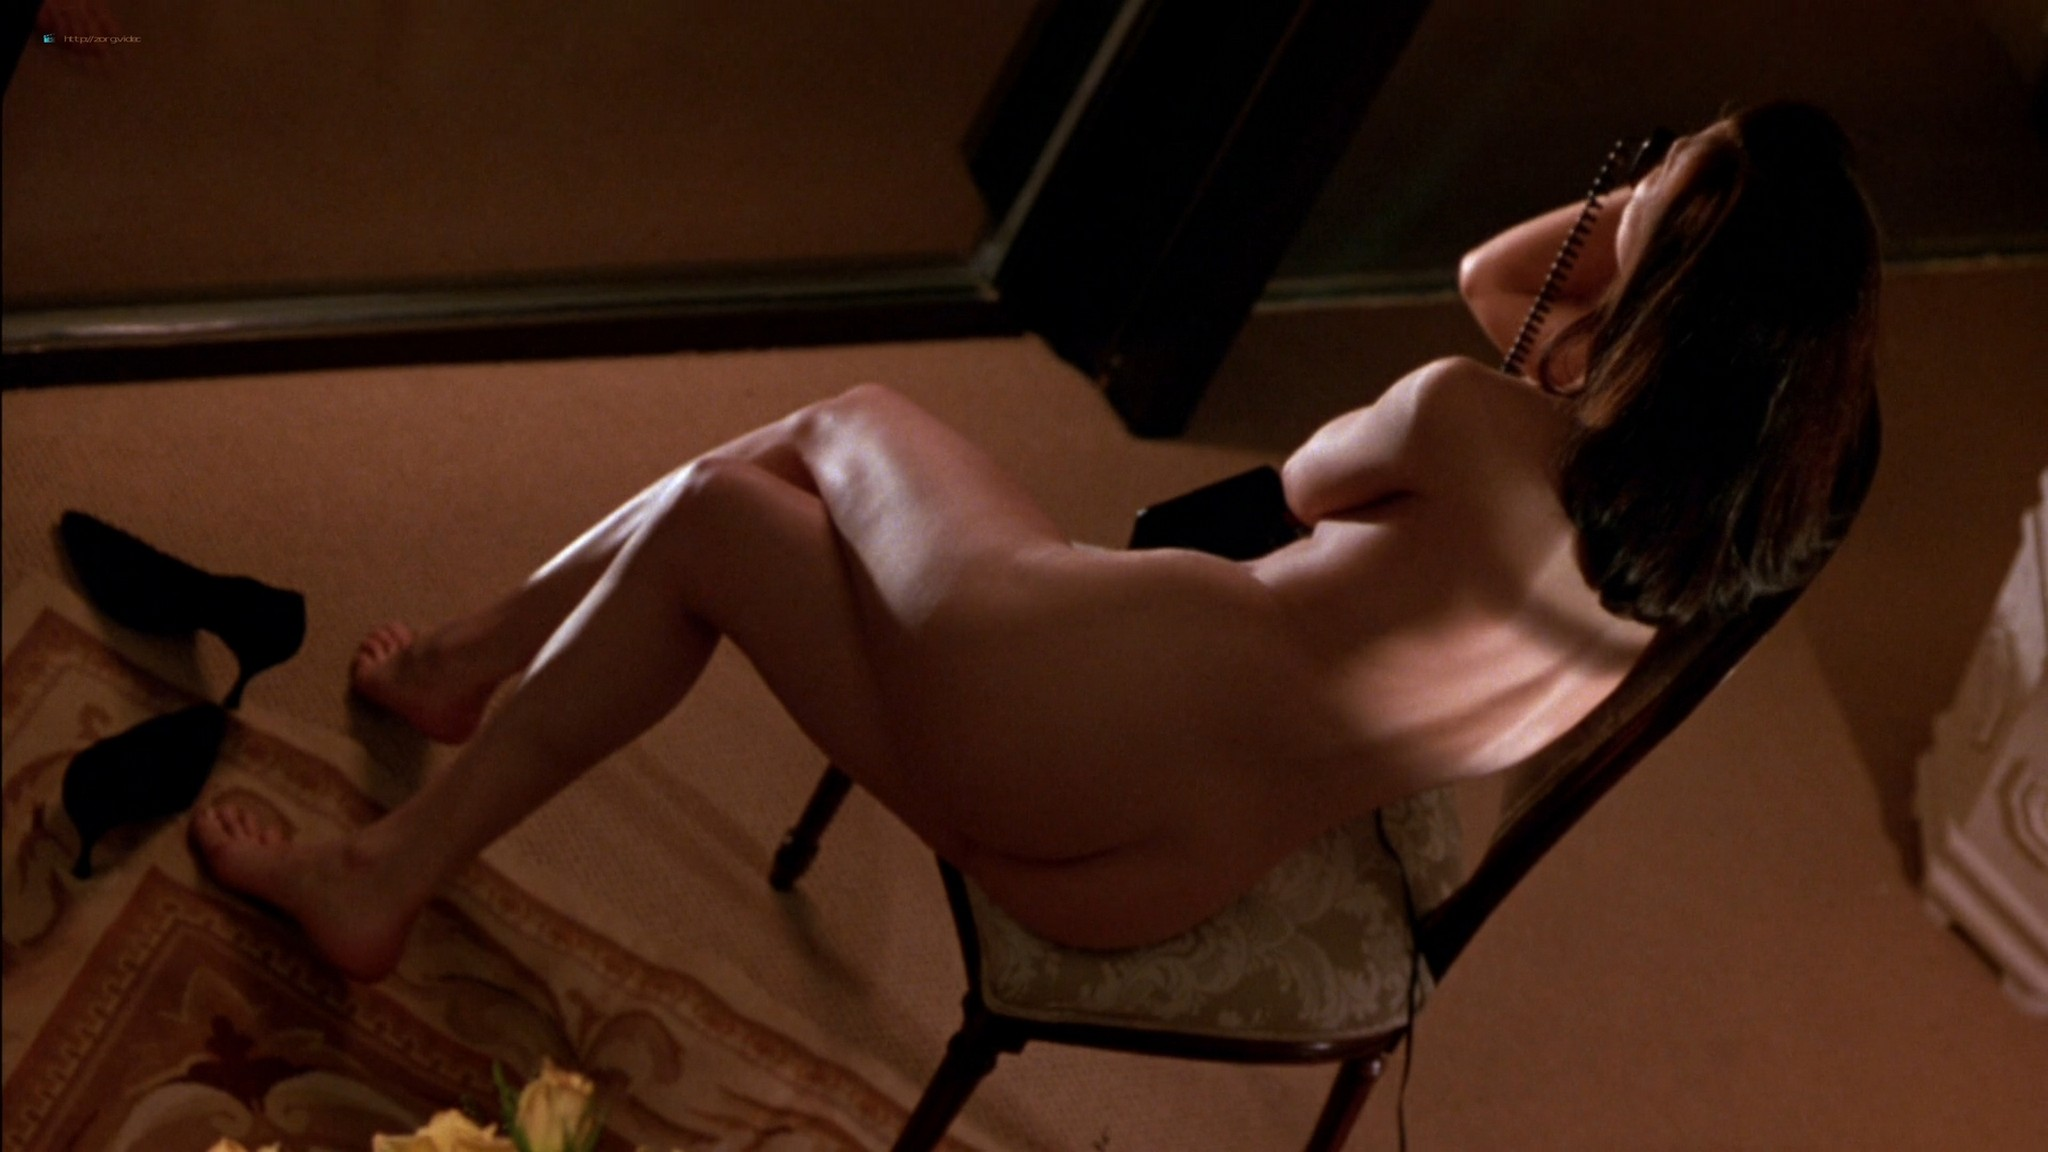 Linda Fiorentino nude Angie Everhart nude full frontal - Jade (1995) HD 1080p BluRay (17)